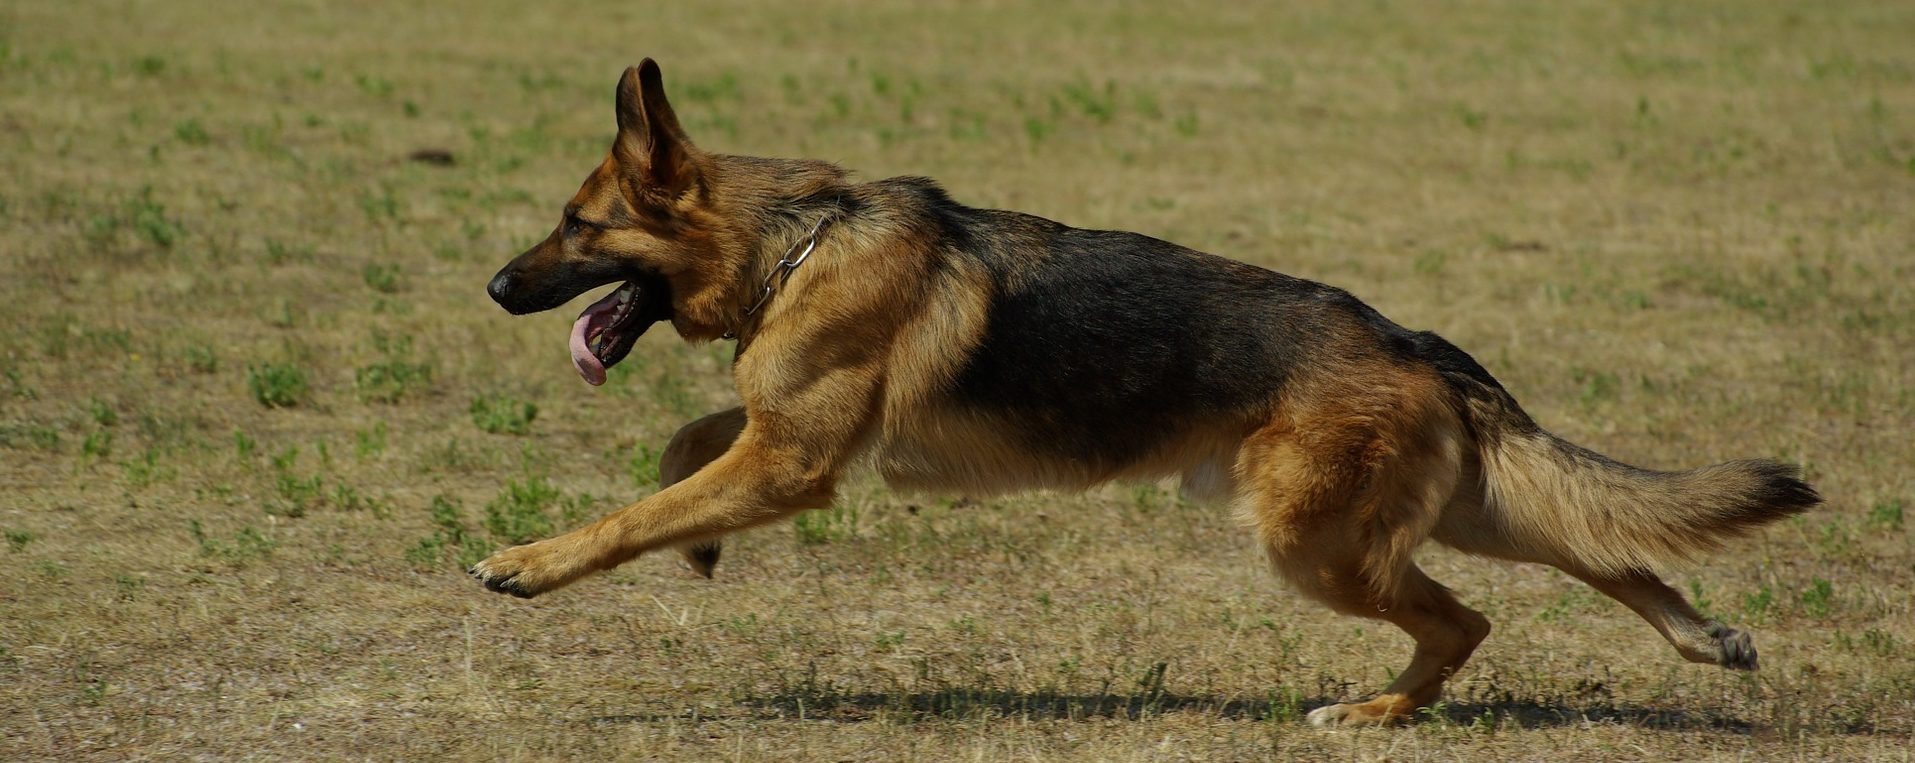 Atrofia muscular rehabilitación veterinaria